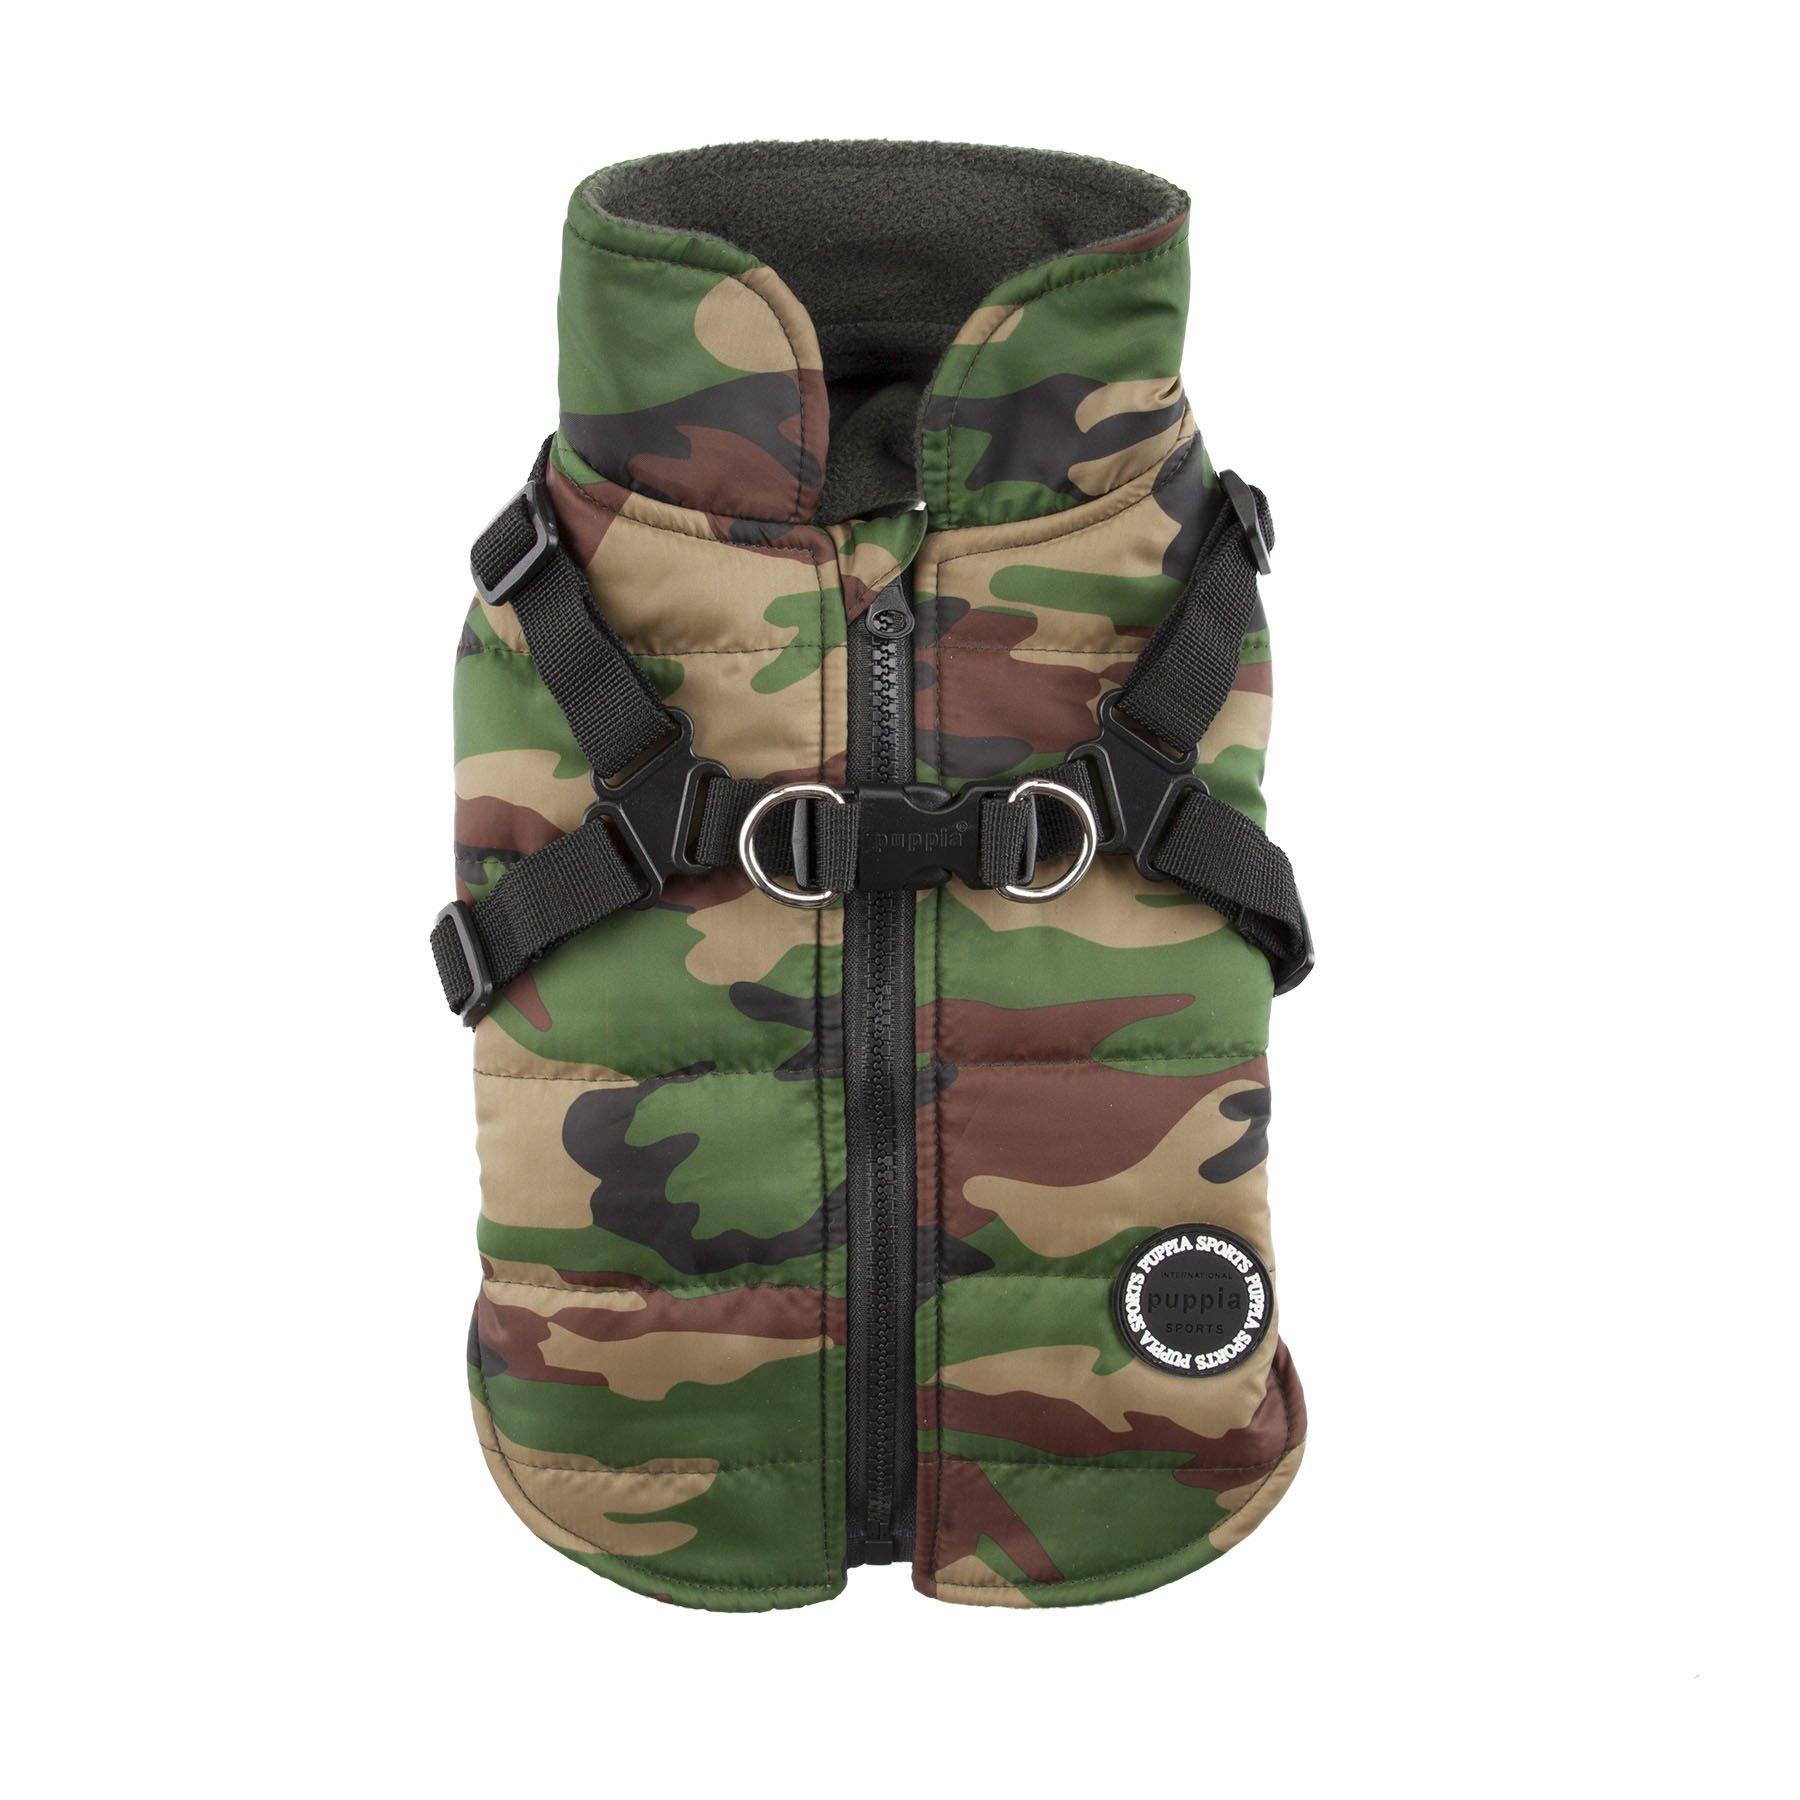 Puppia Authentic Mountaineer II Winter Vest, Medium, Camo